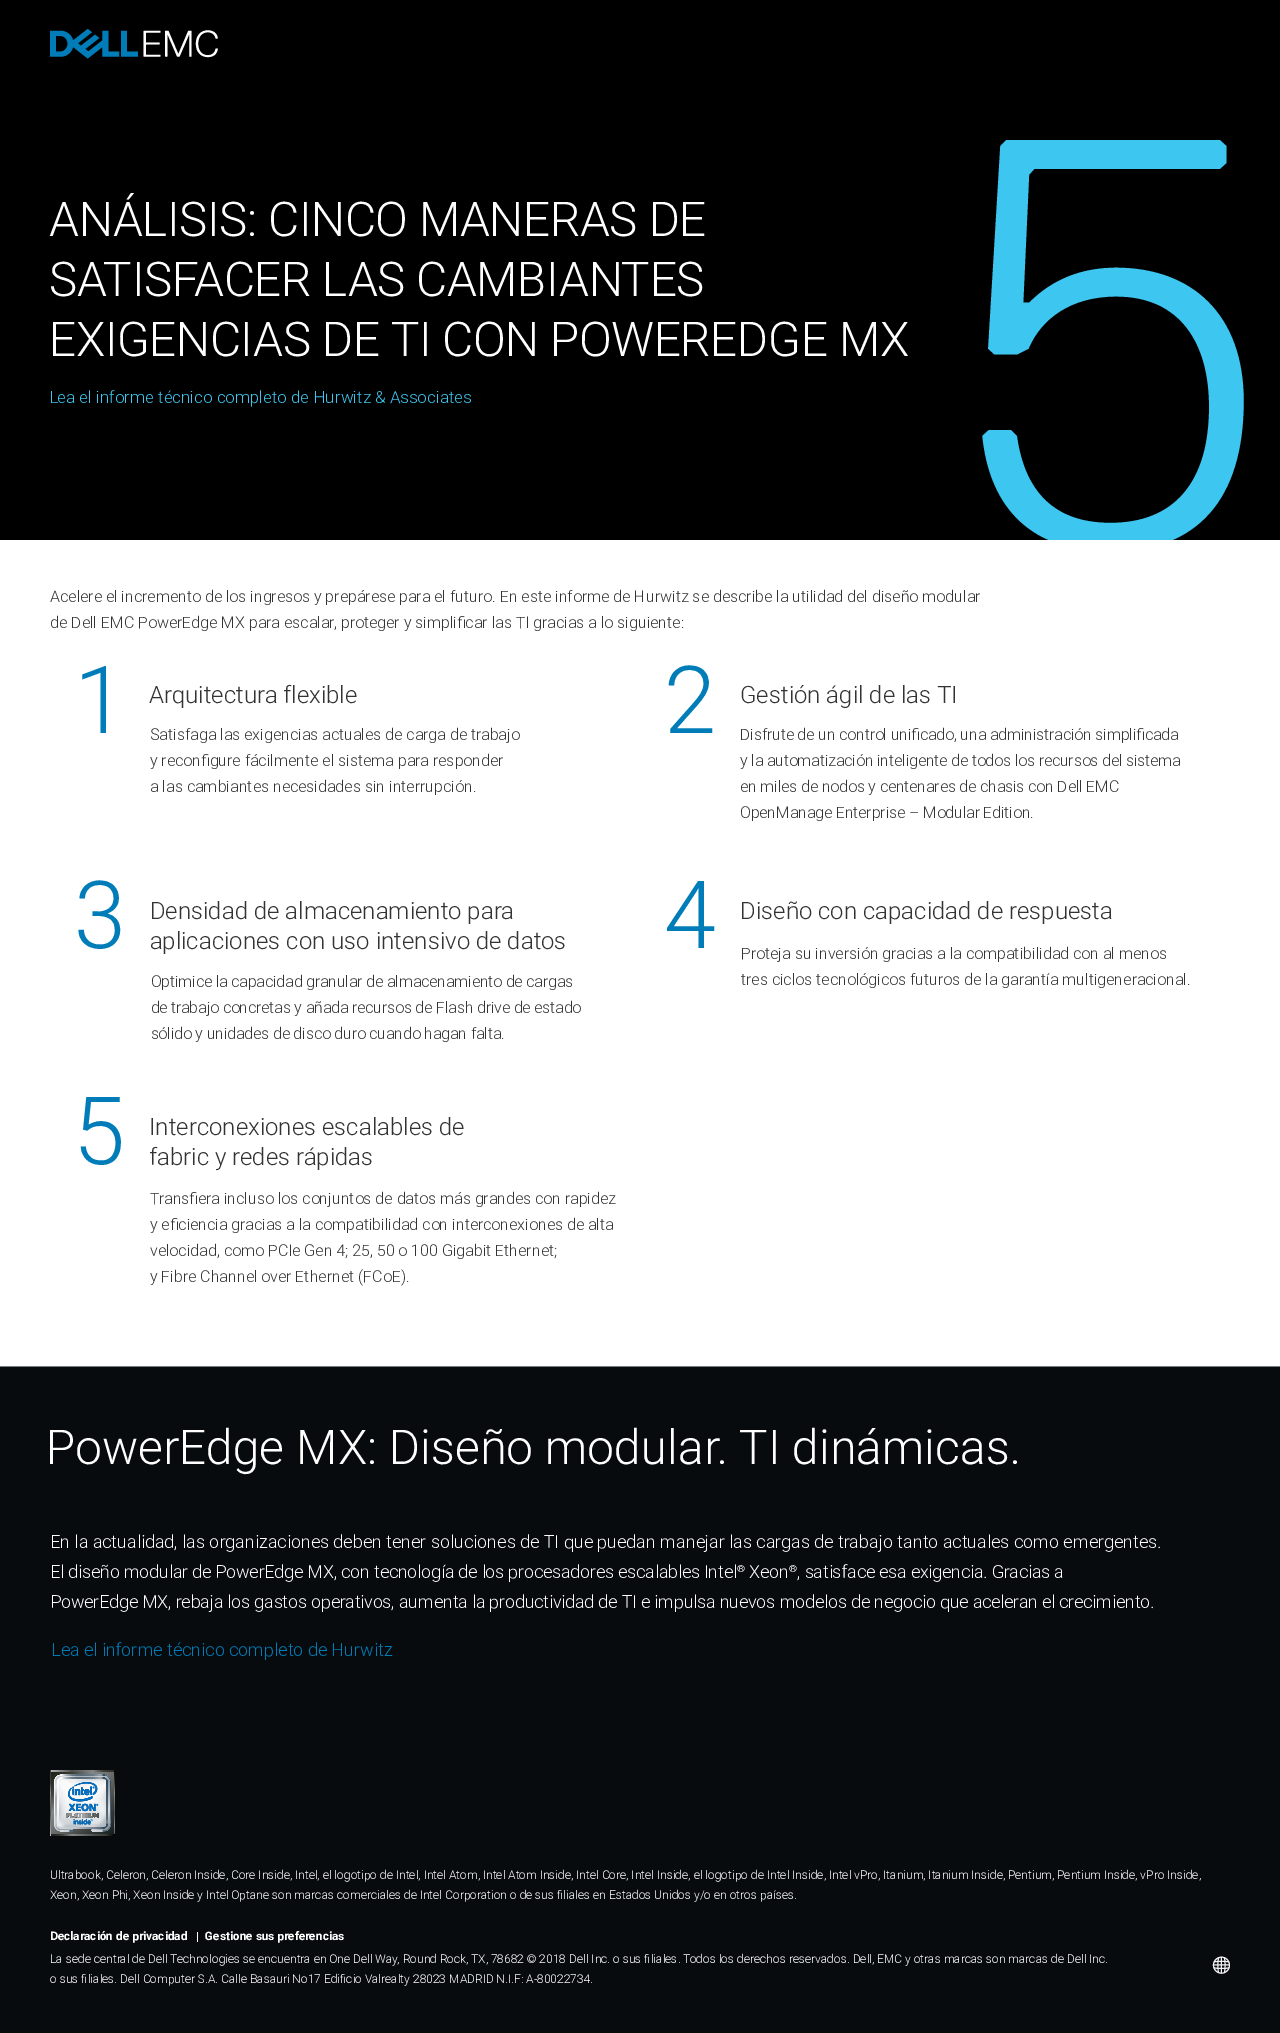 Thumb original spaindellemc 5 ways poweredge mx meets changing it demands